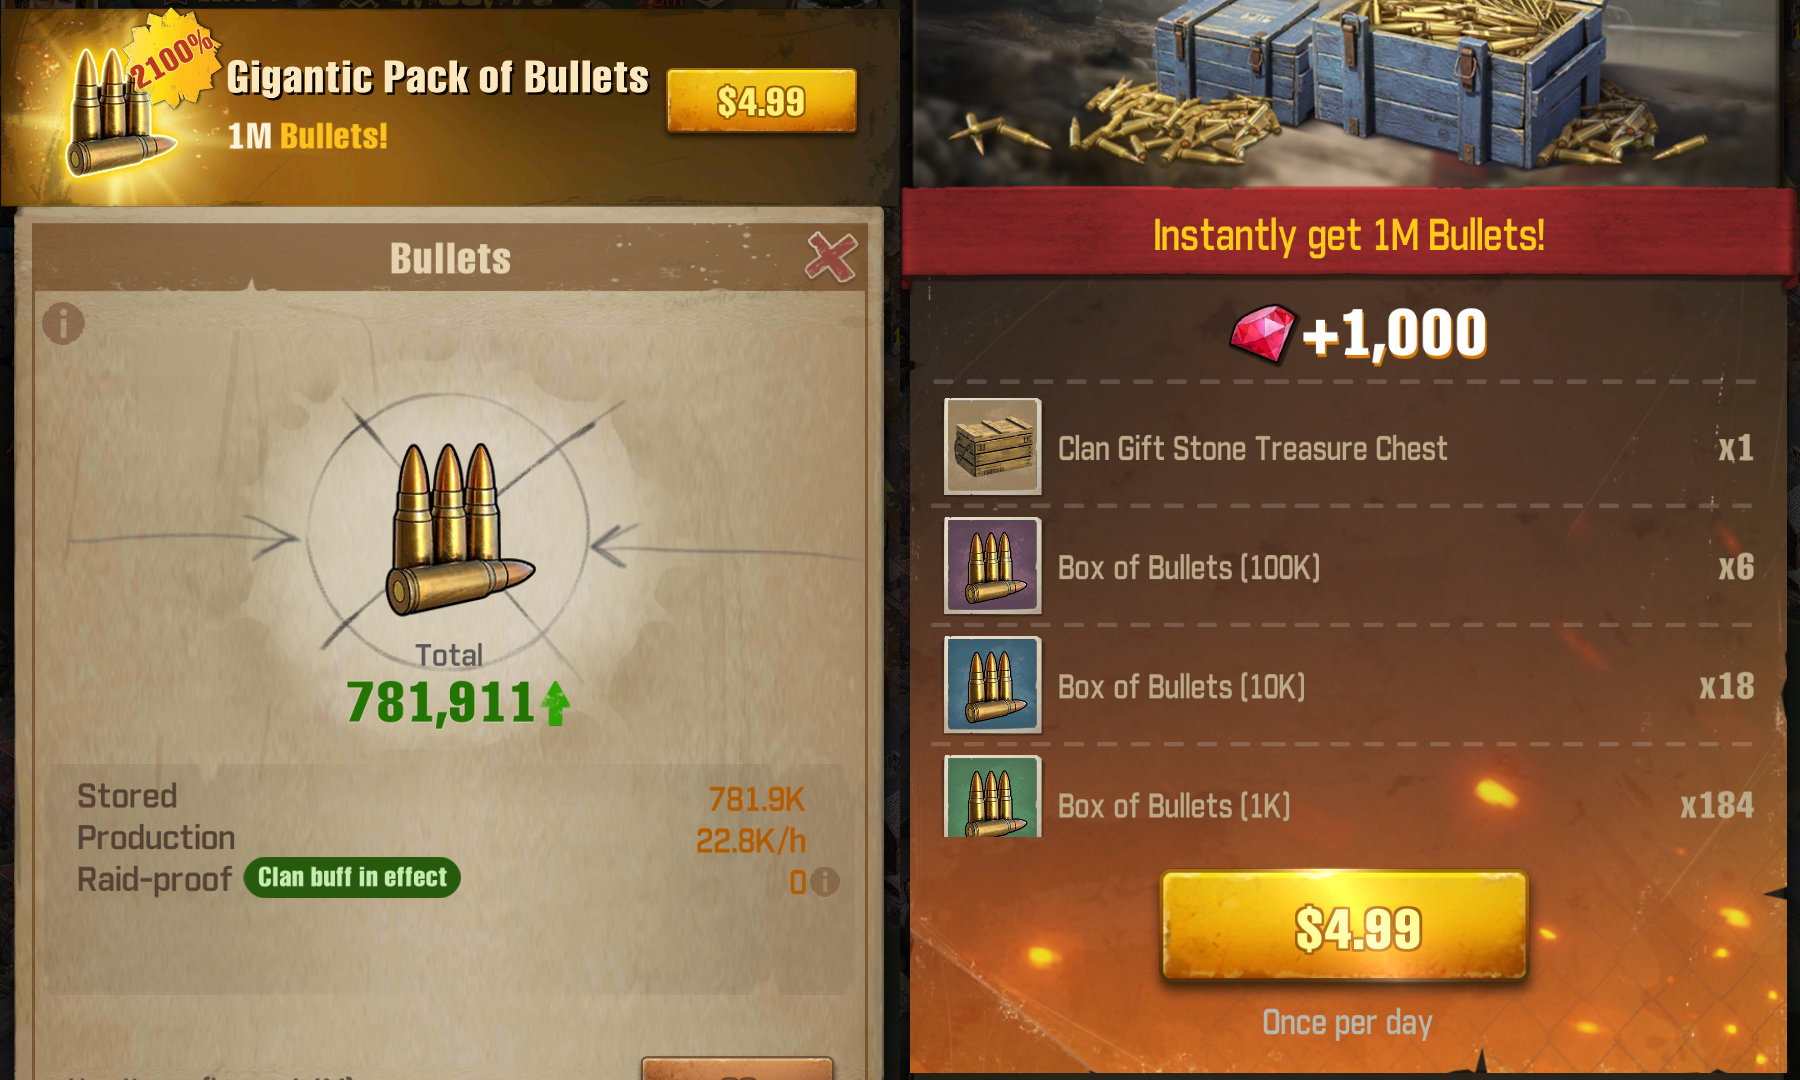 The Walking Dead Survivors - Gigantic Pack of Bullets